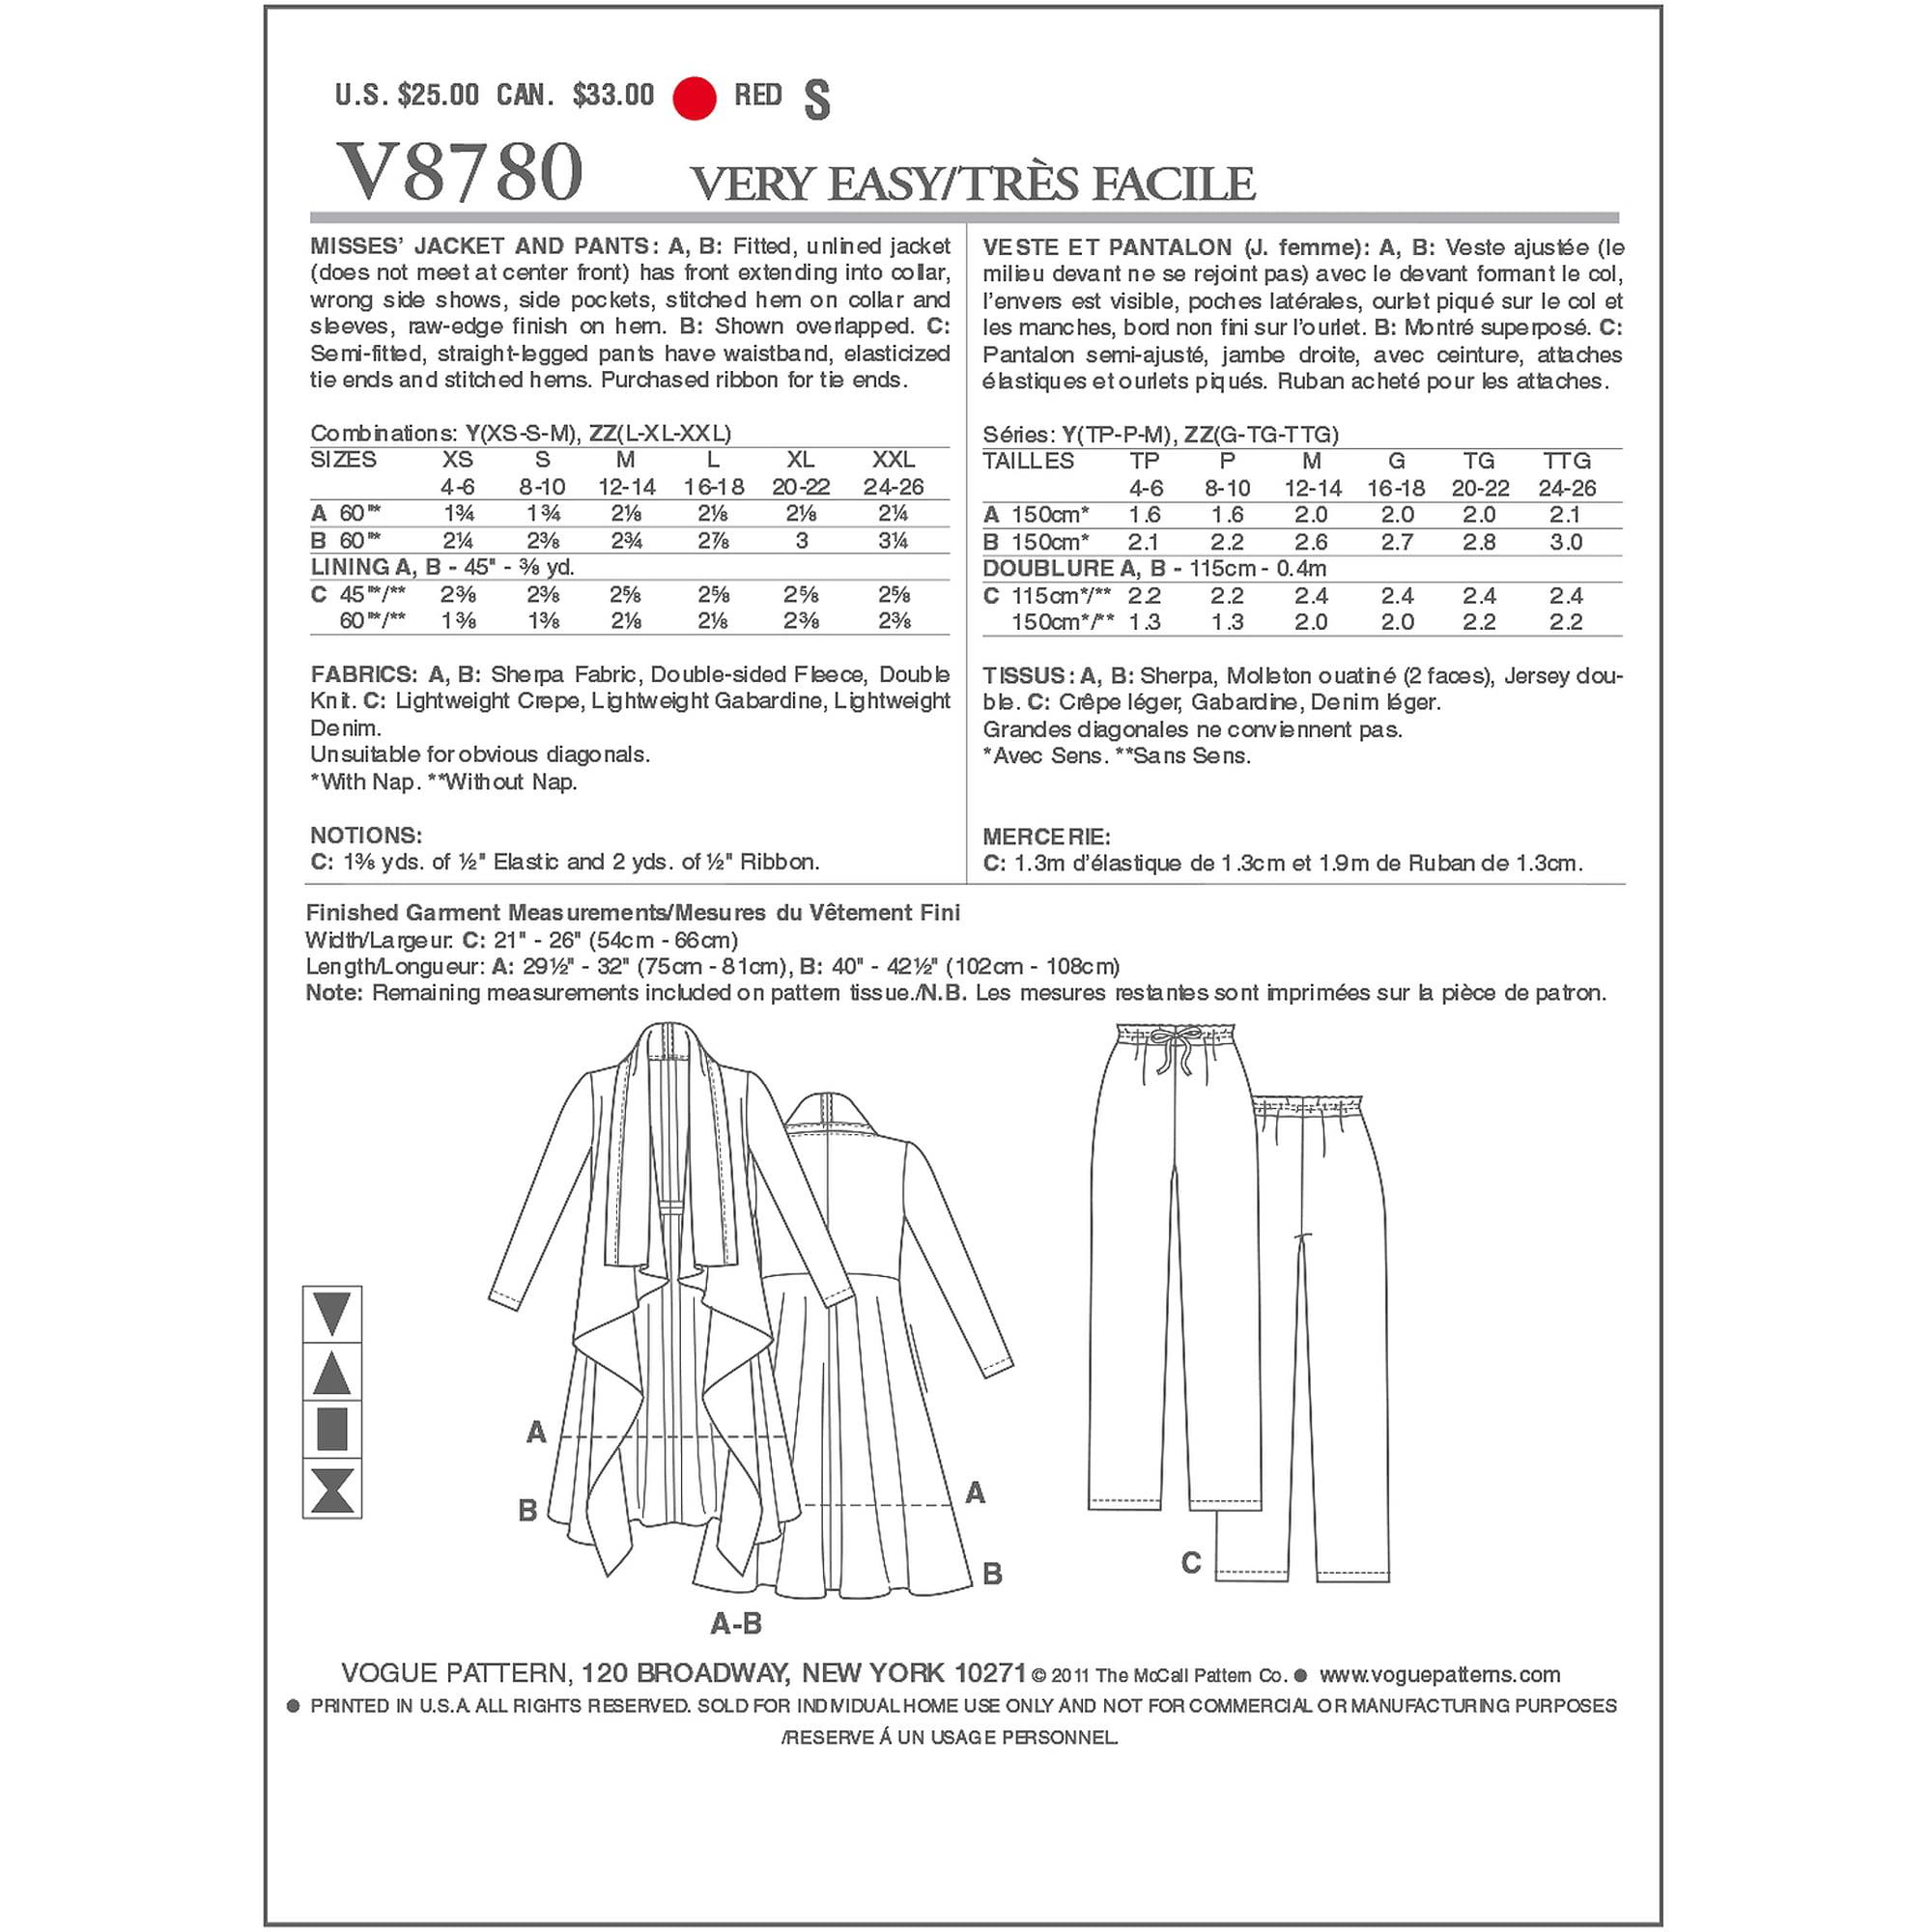 Vogue Pattern Misses' Jacket and Pants, Y (XS, S, M)